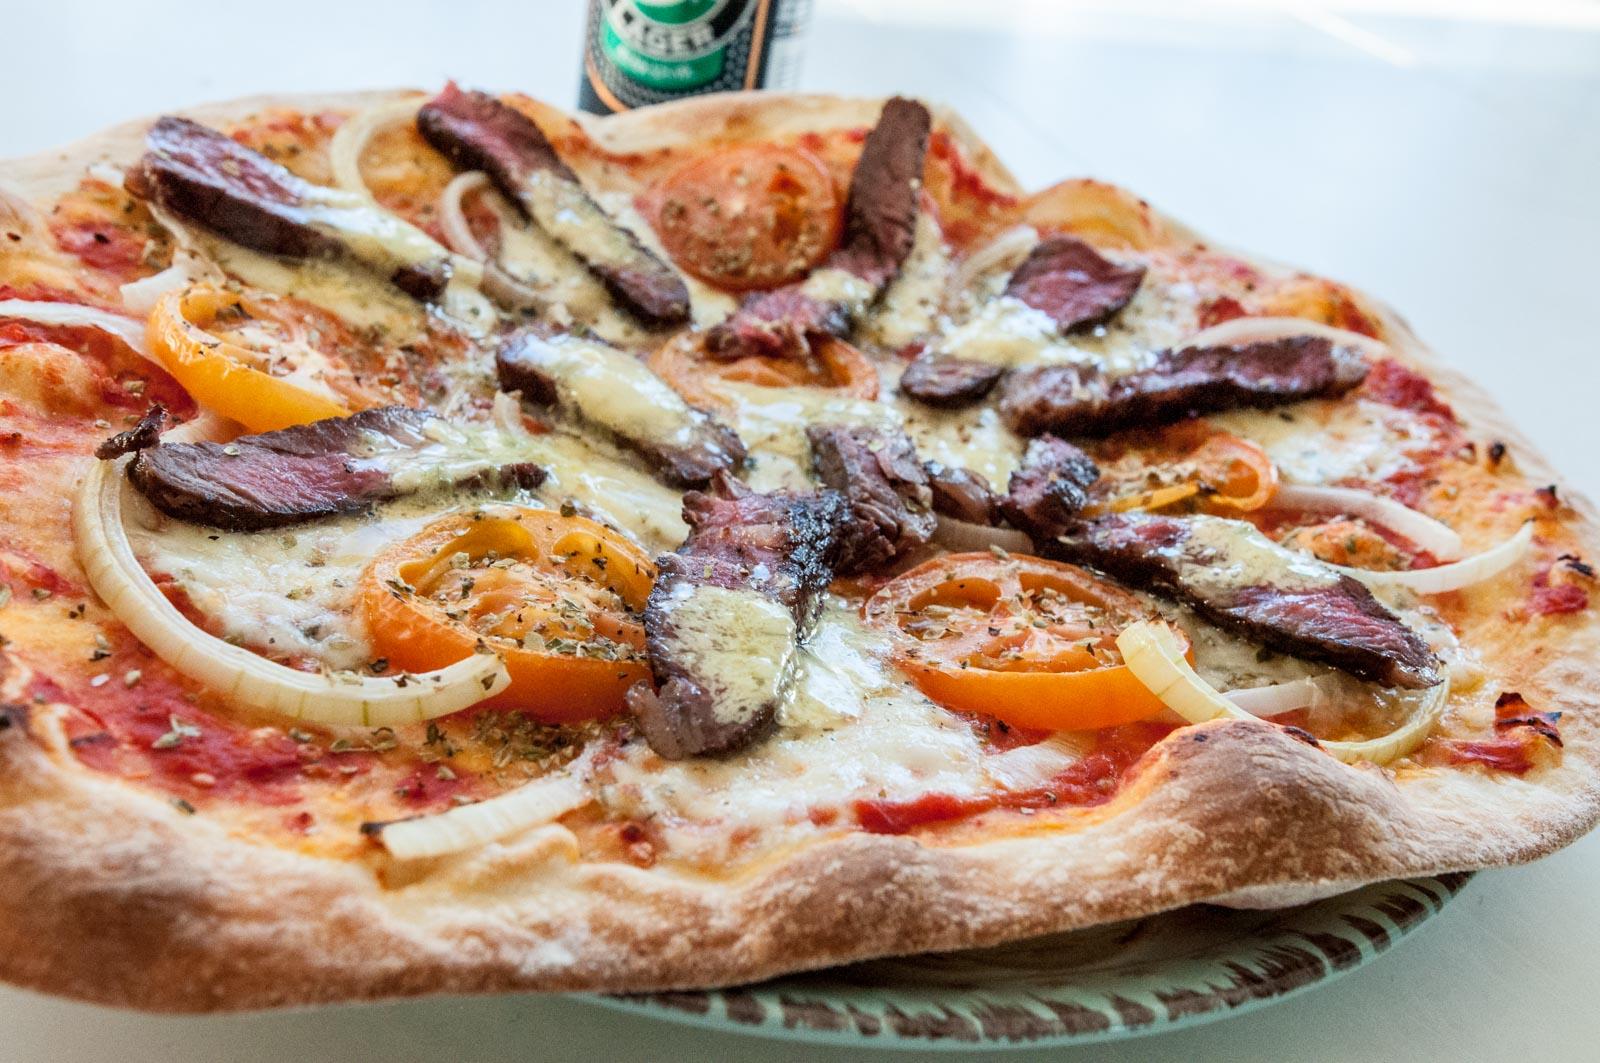 enkel pizzadeg med jäst